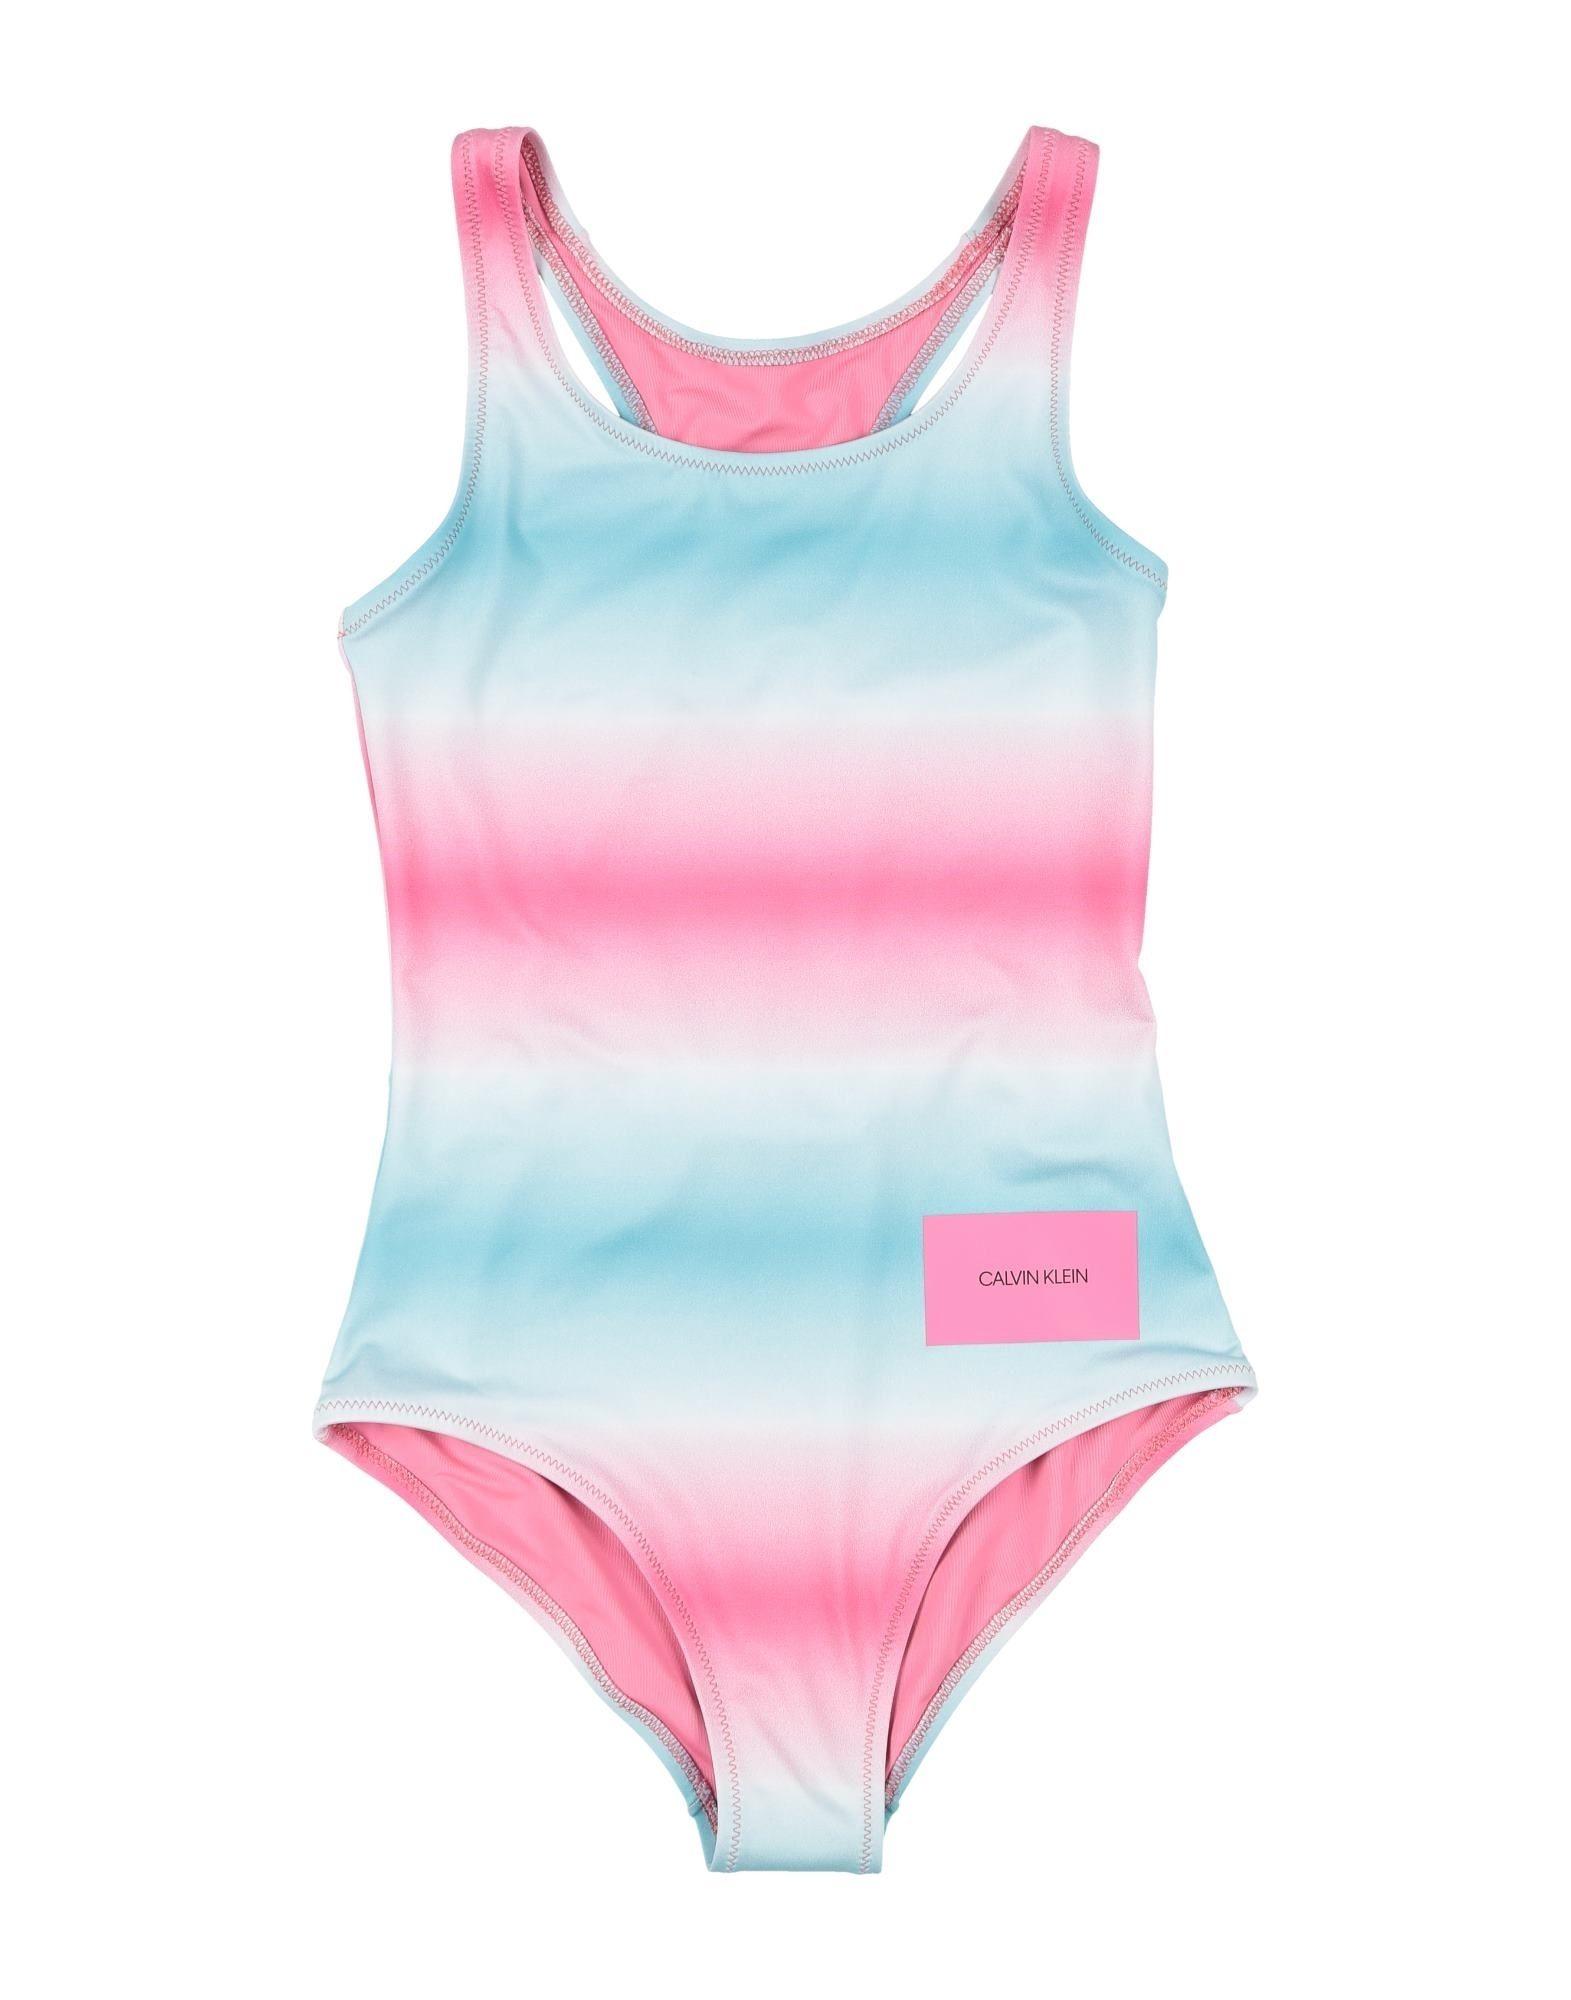 CALVIN KLEIN   CALVIN KLEIN One-Piece Swimsuits 47247738   Goxip